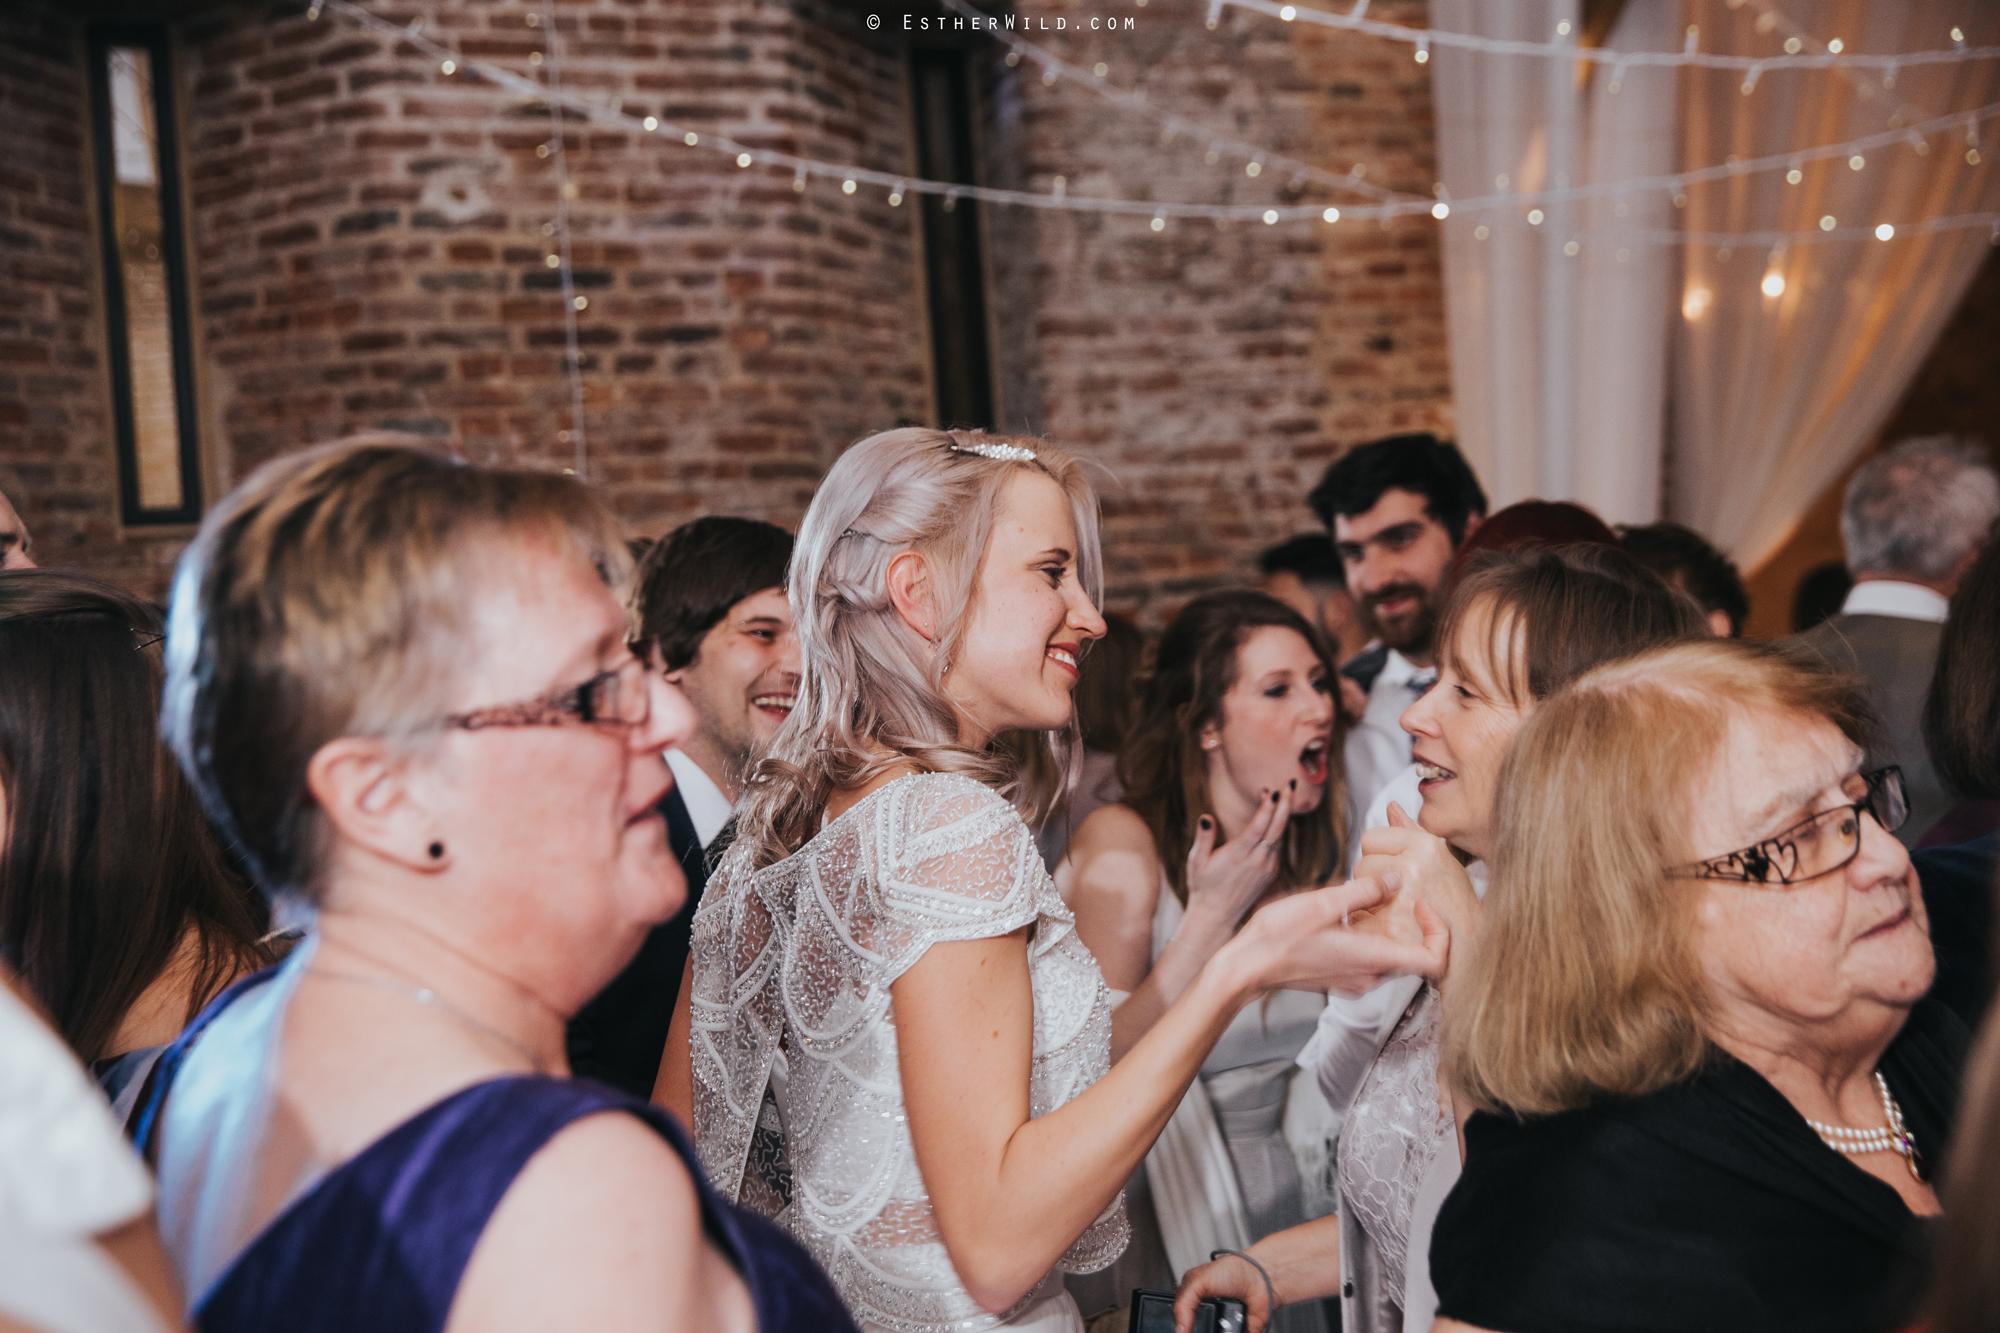 Elms_Barn_Weddings_Suffolk_Photographer_Copyright_Esther_Wild_IMG_3589.jpg